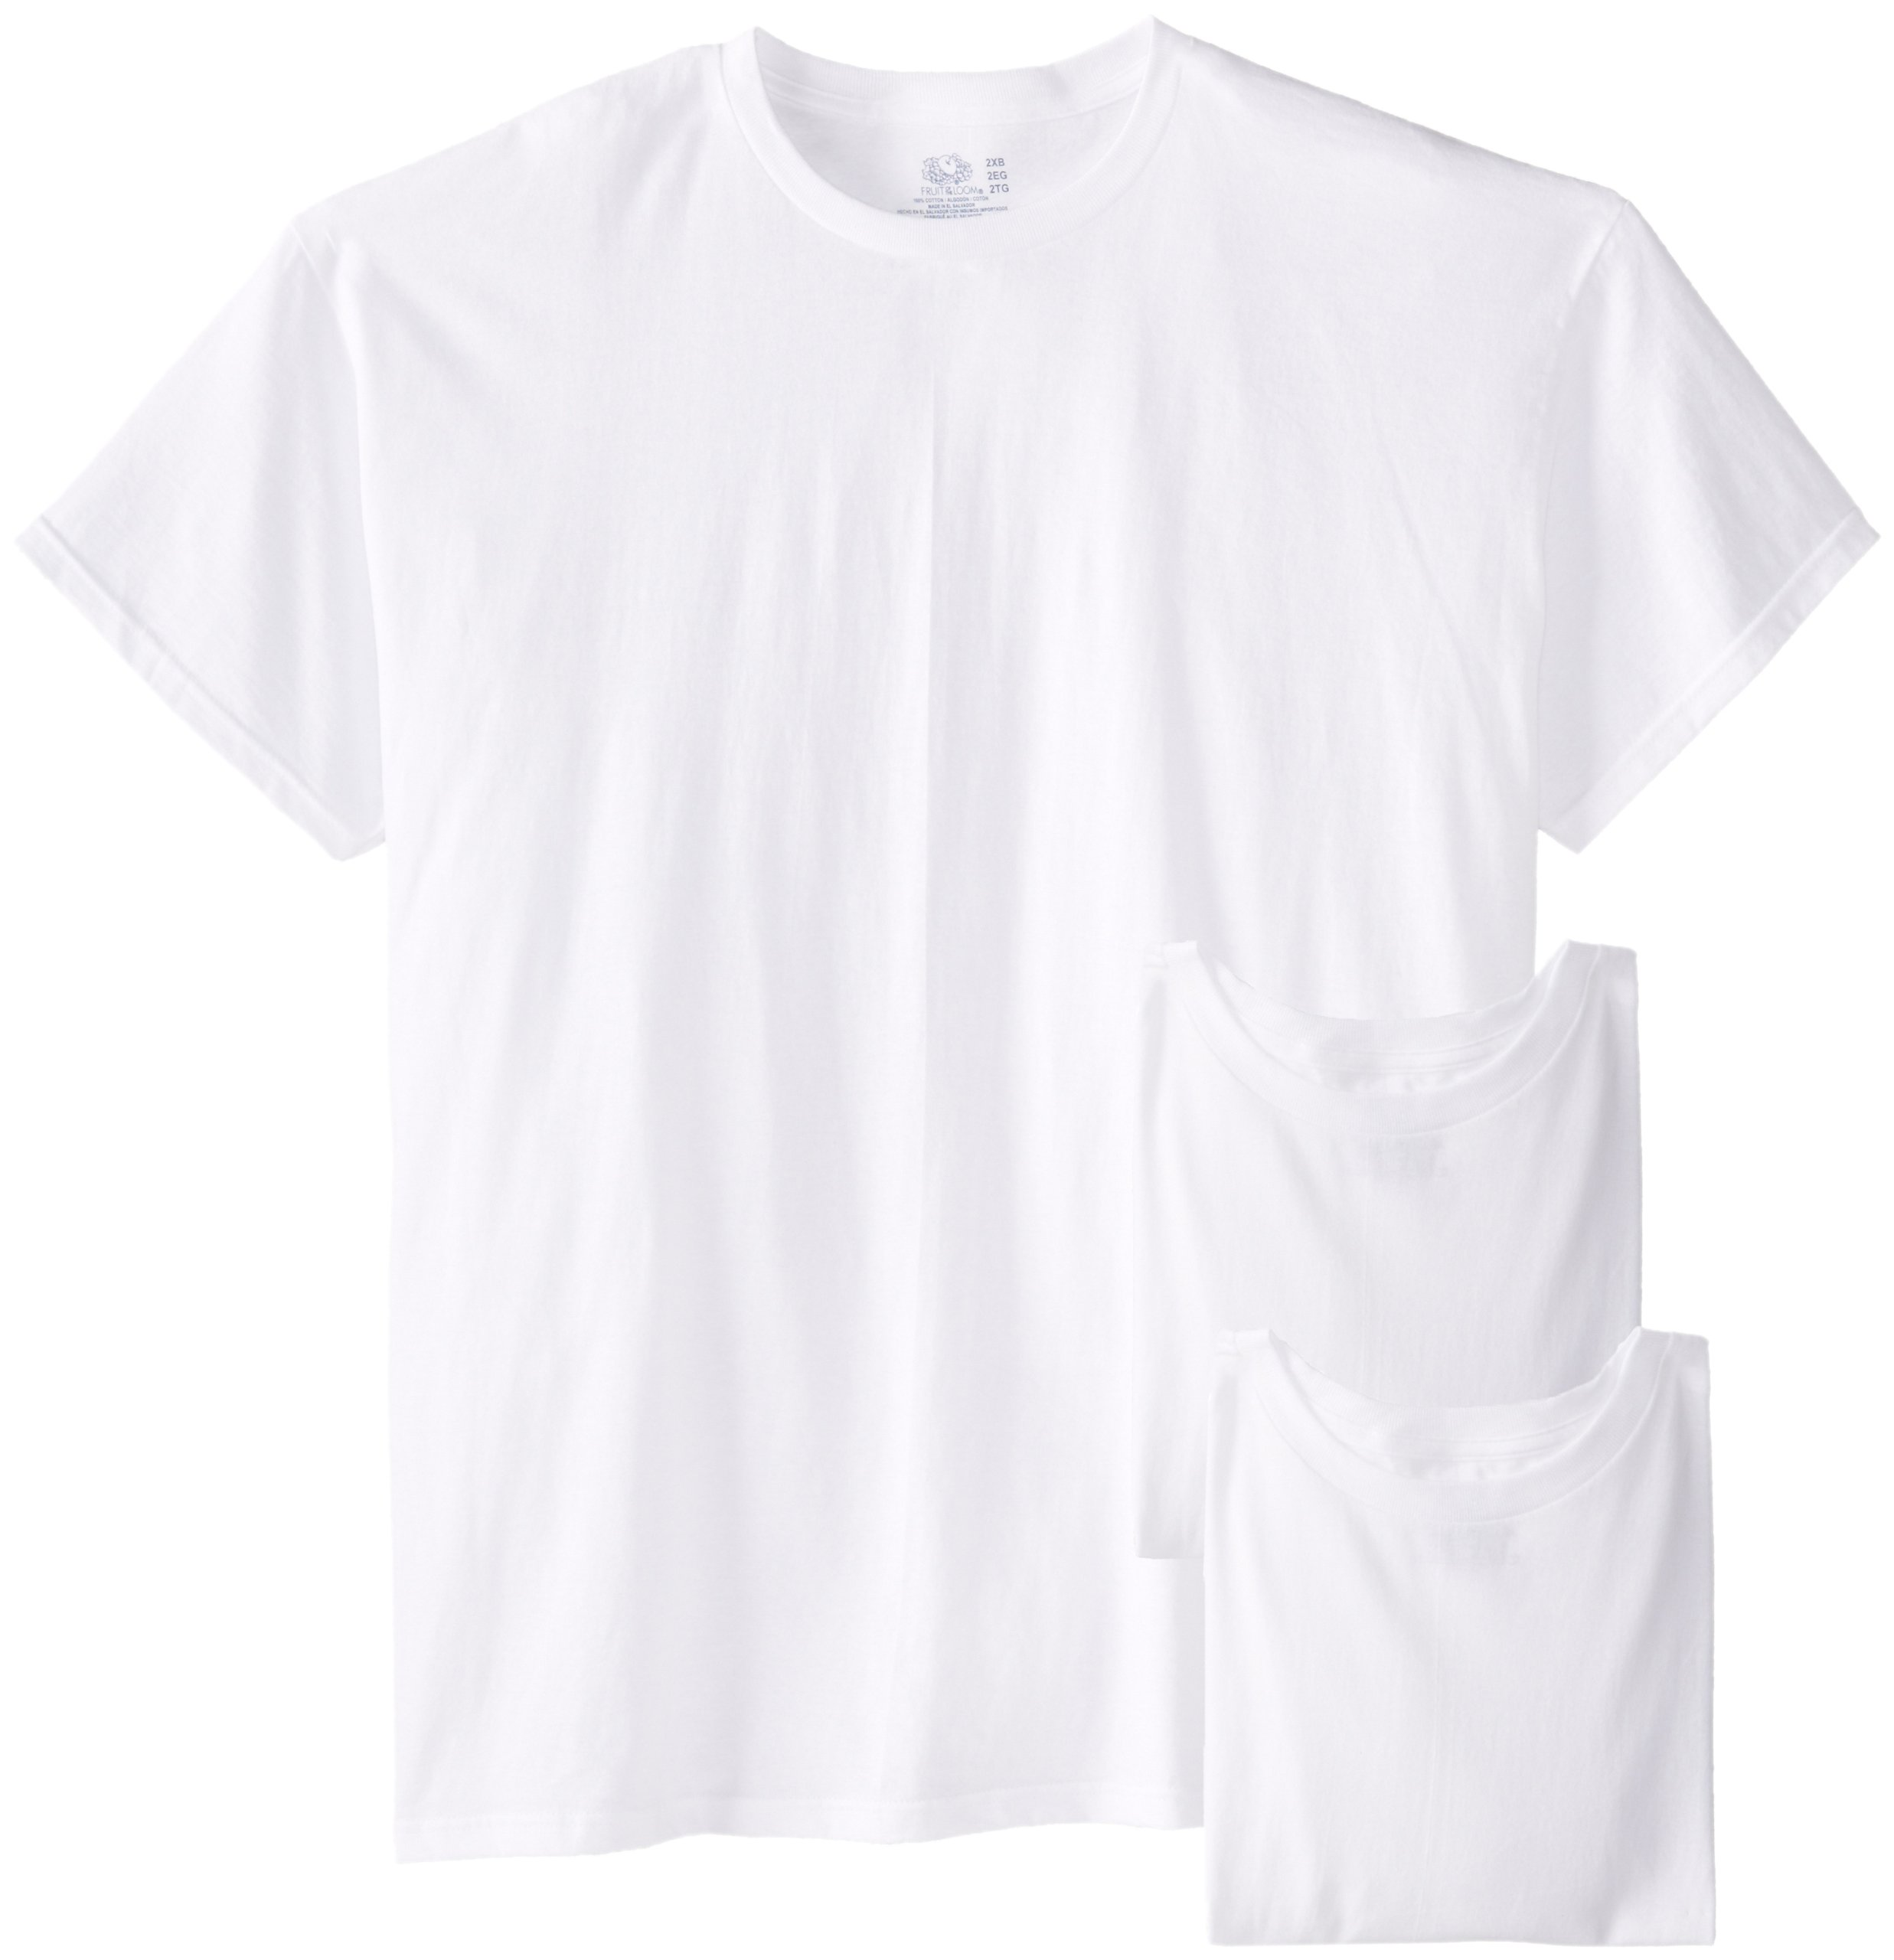 Fruit of the Loom Men's 3-Pack Big Size Crew T-Shirt, White, 4XB